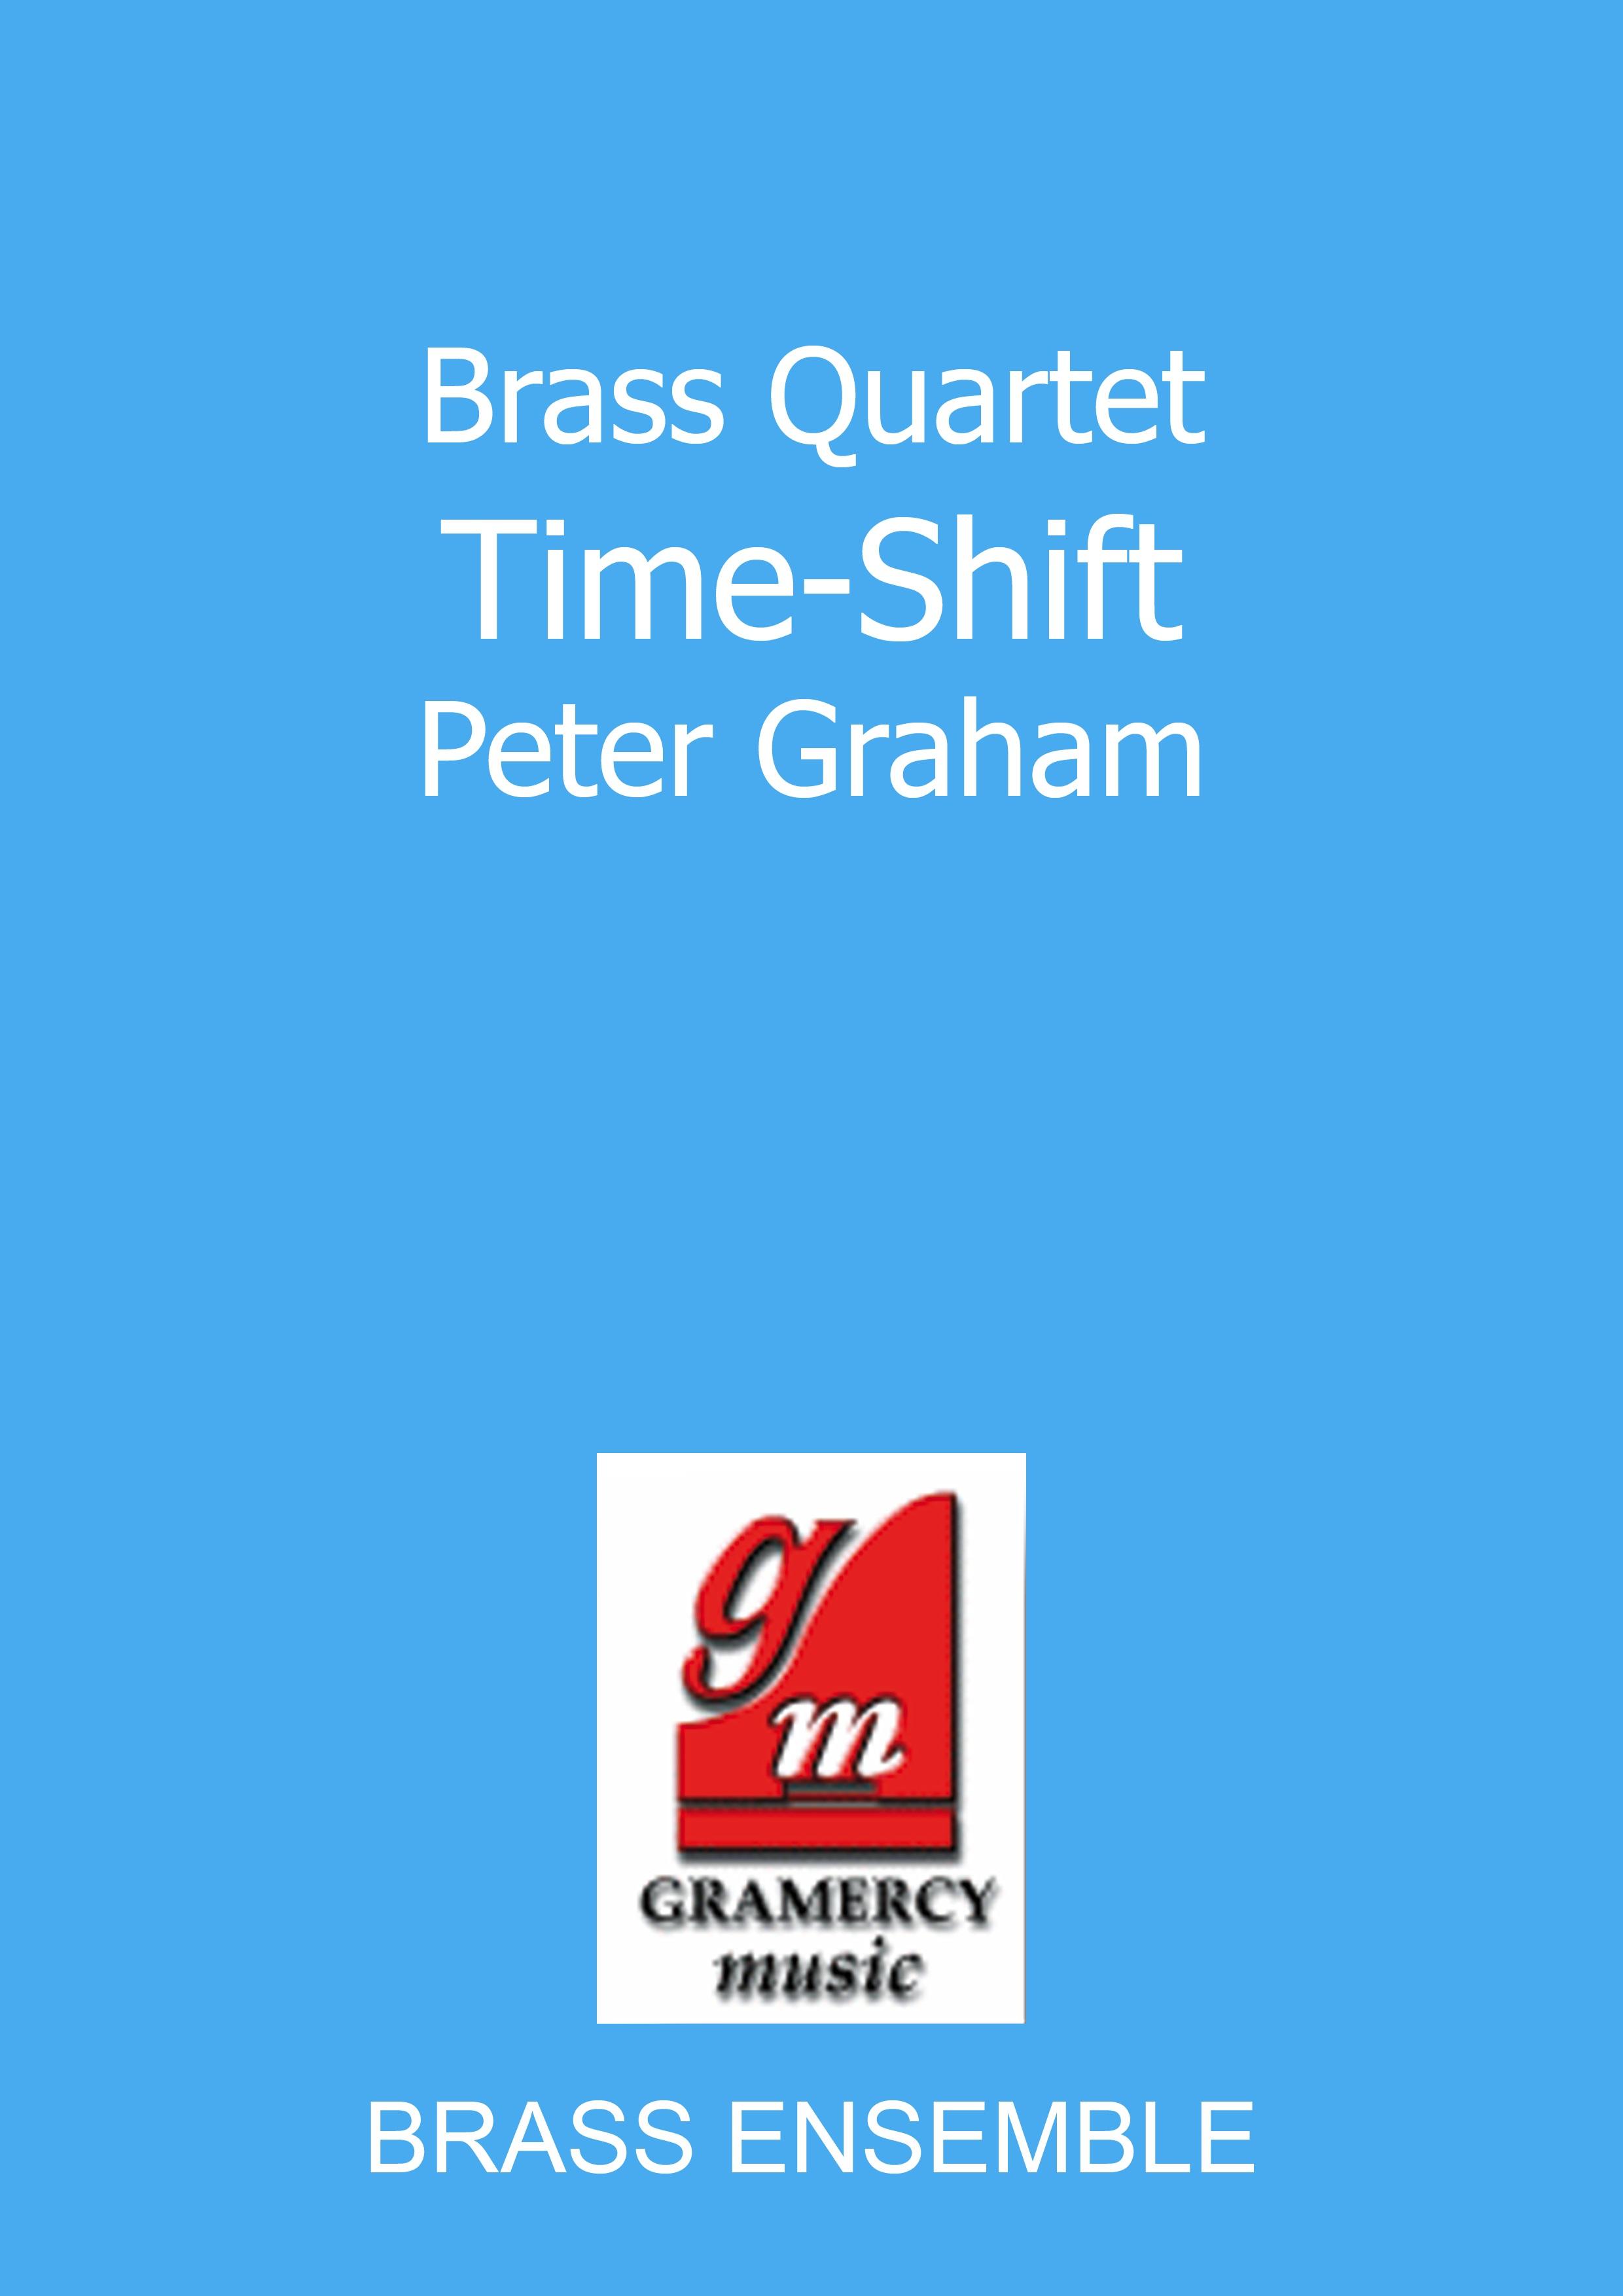 Time-Shift (Brass Quartet)